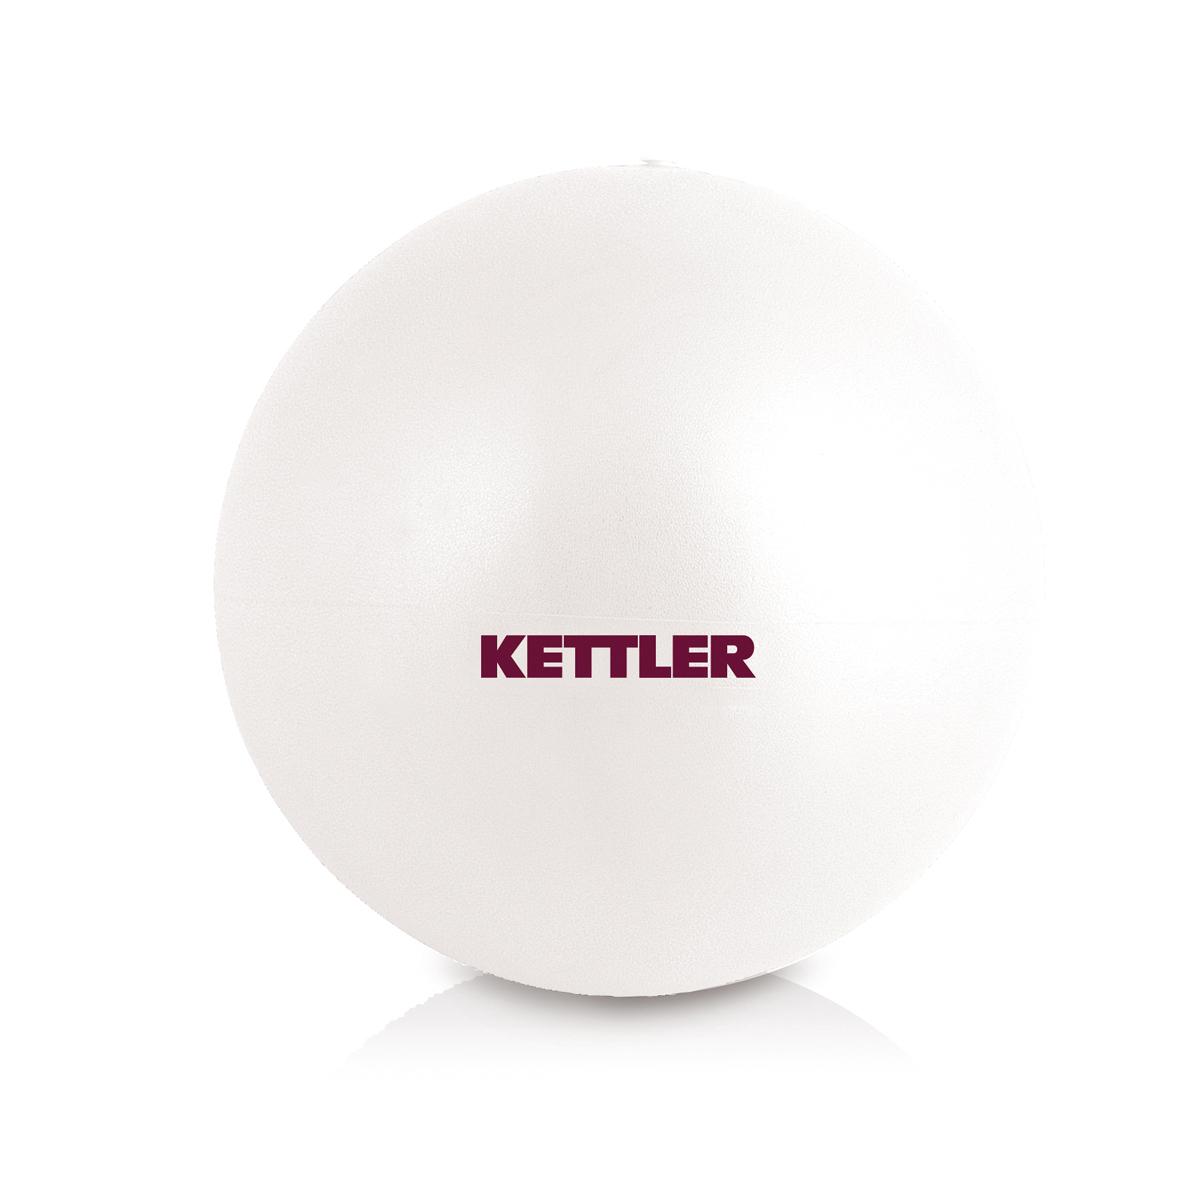 xml-zoga-za-jogo-kettler-bela-1